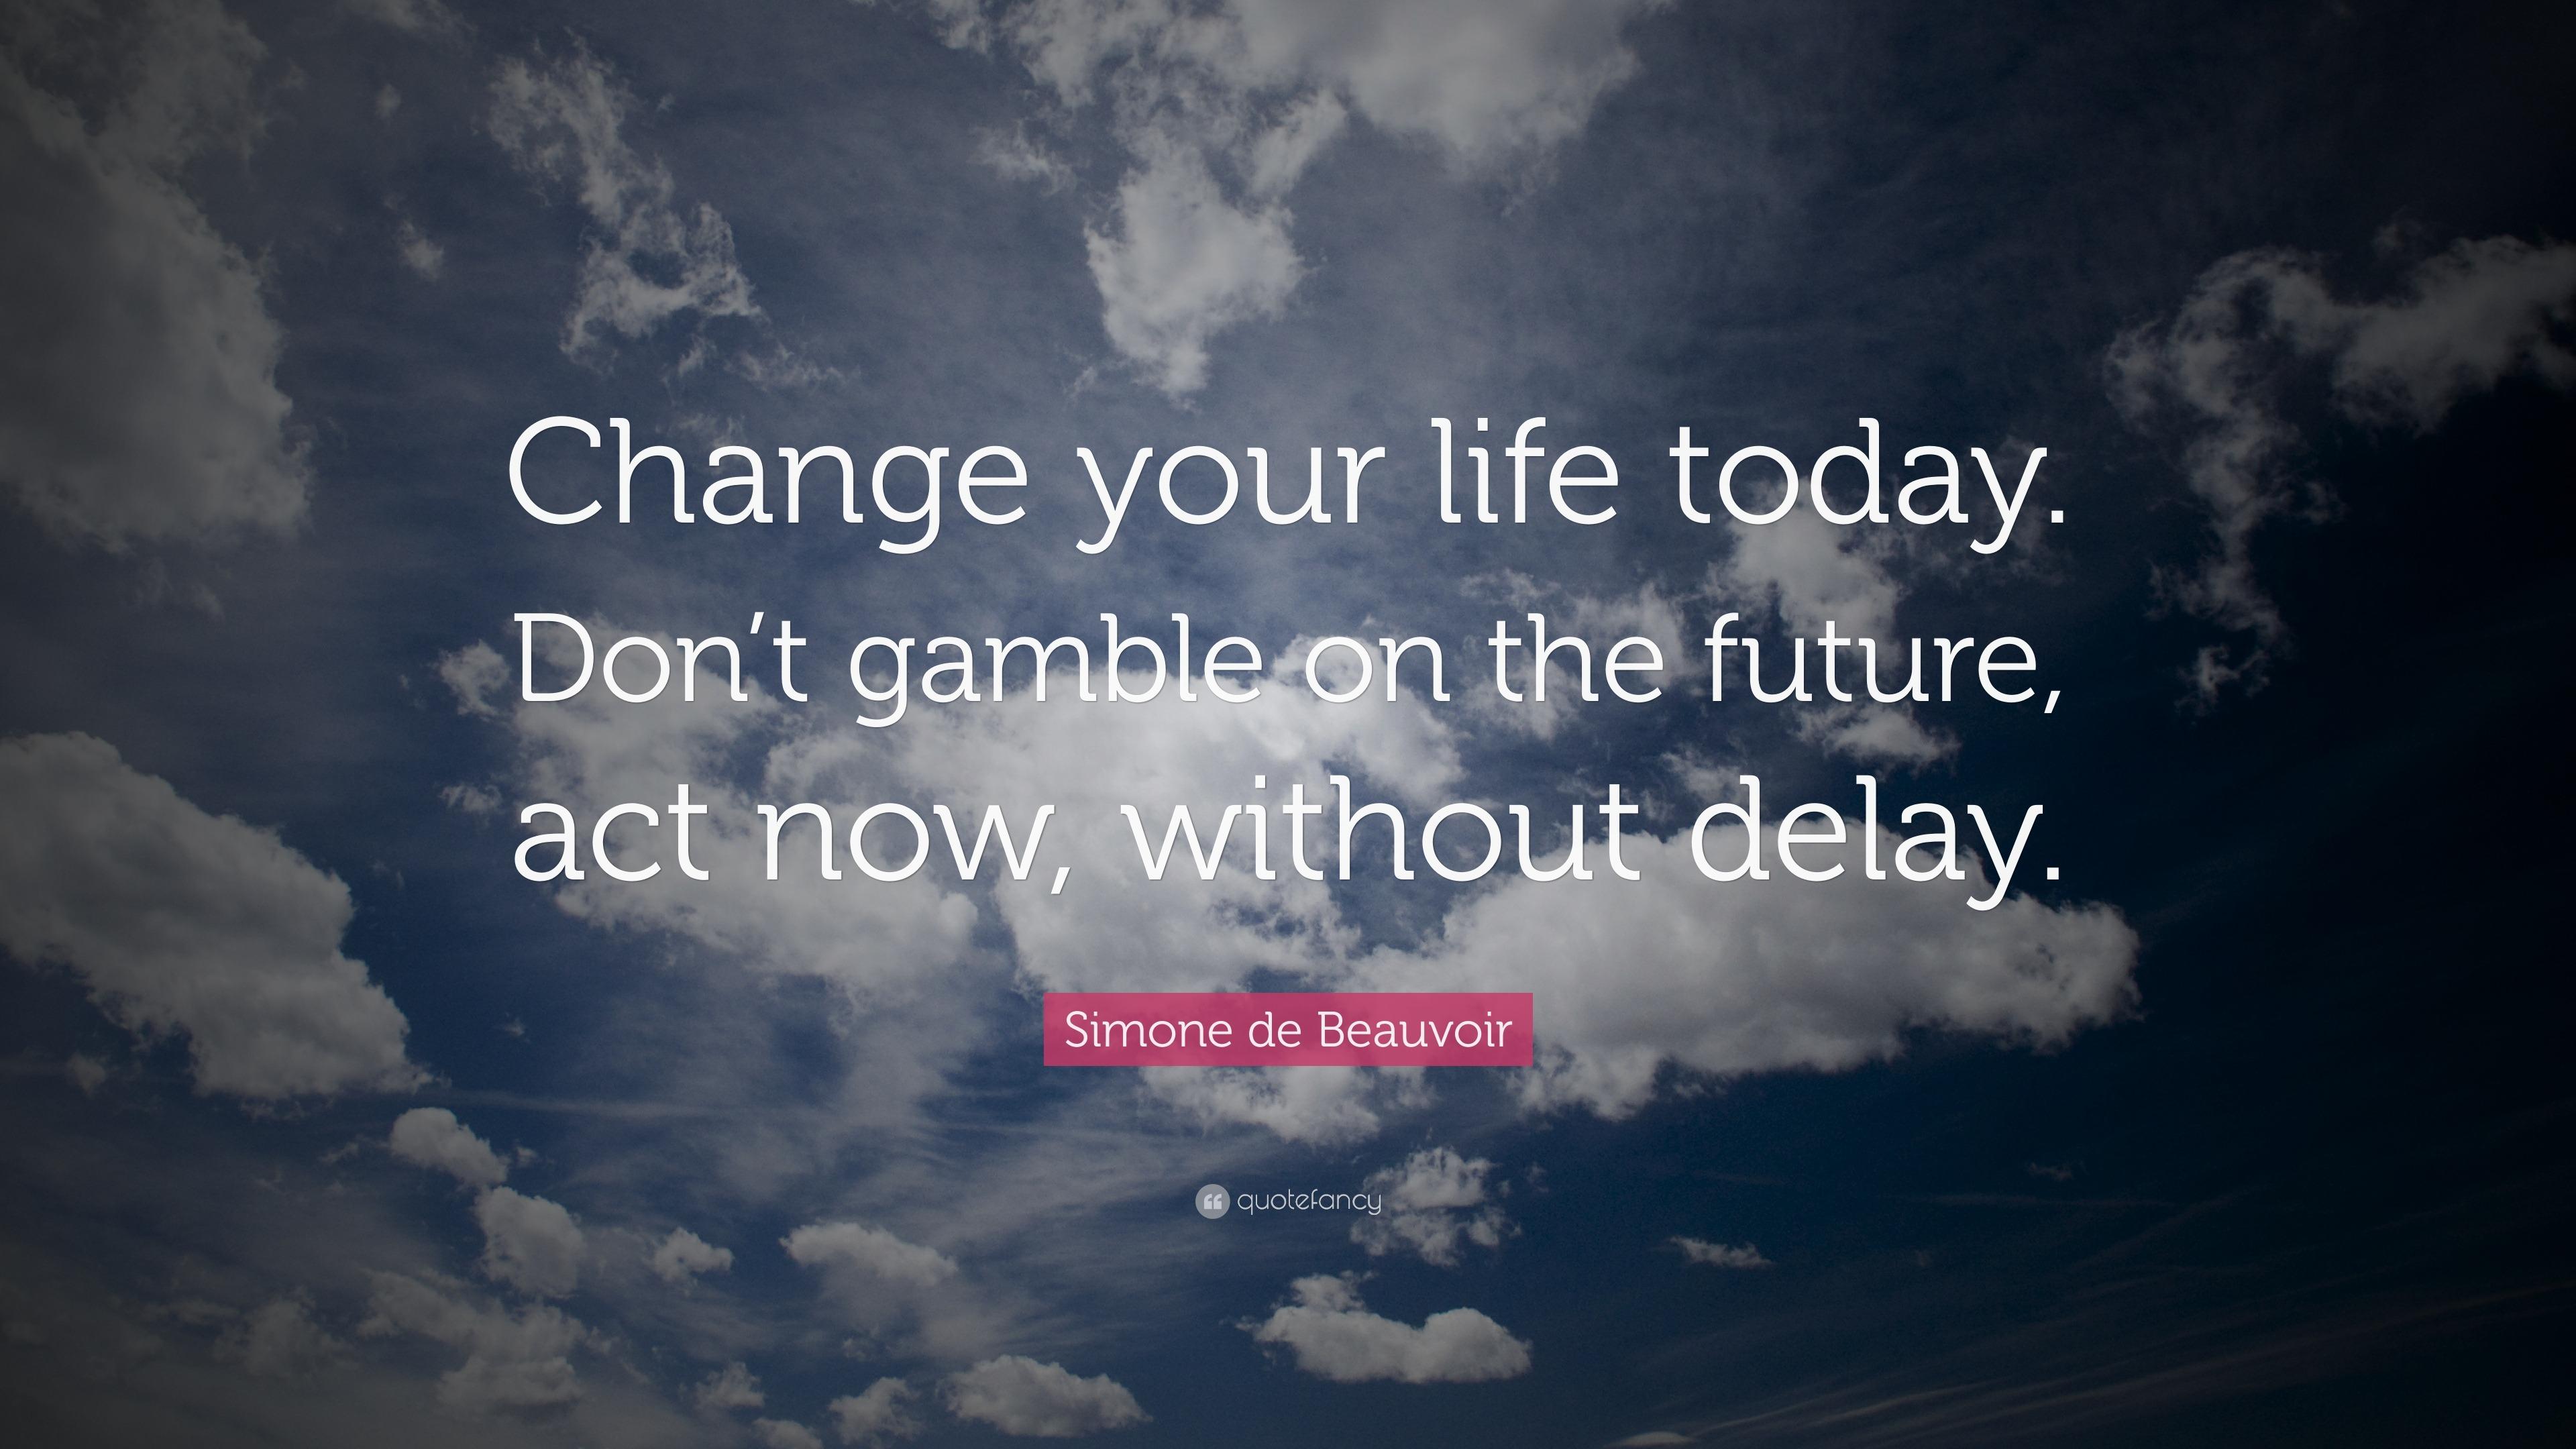 Simone De Beauvoir Quote: U201cChange Your Life Today. Donu0027t Gamble On